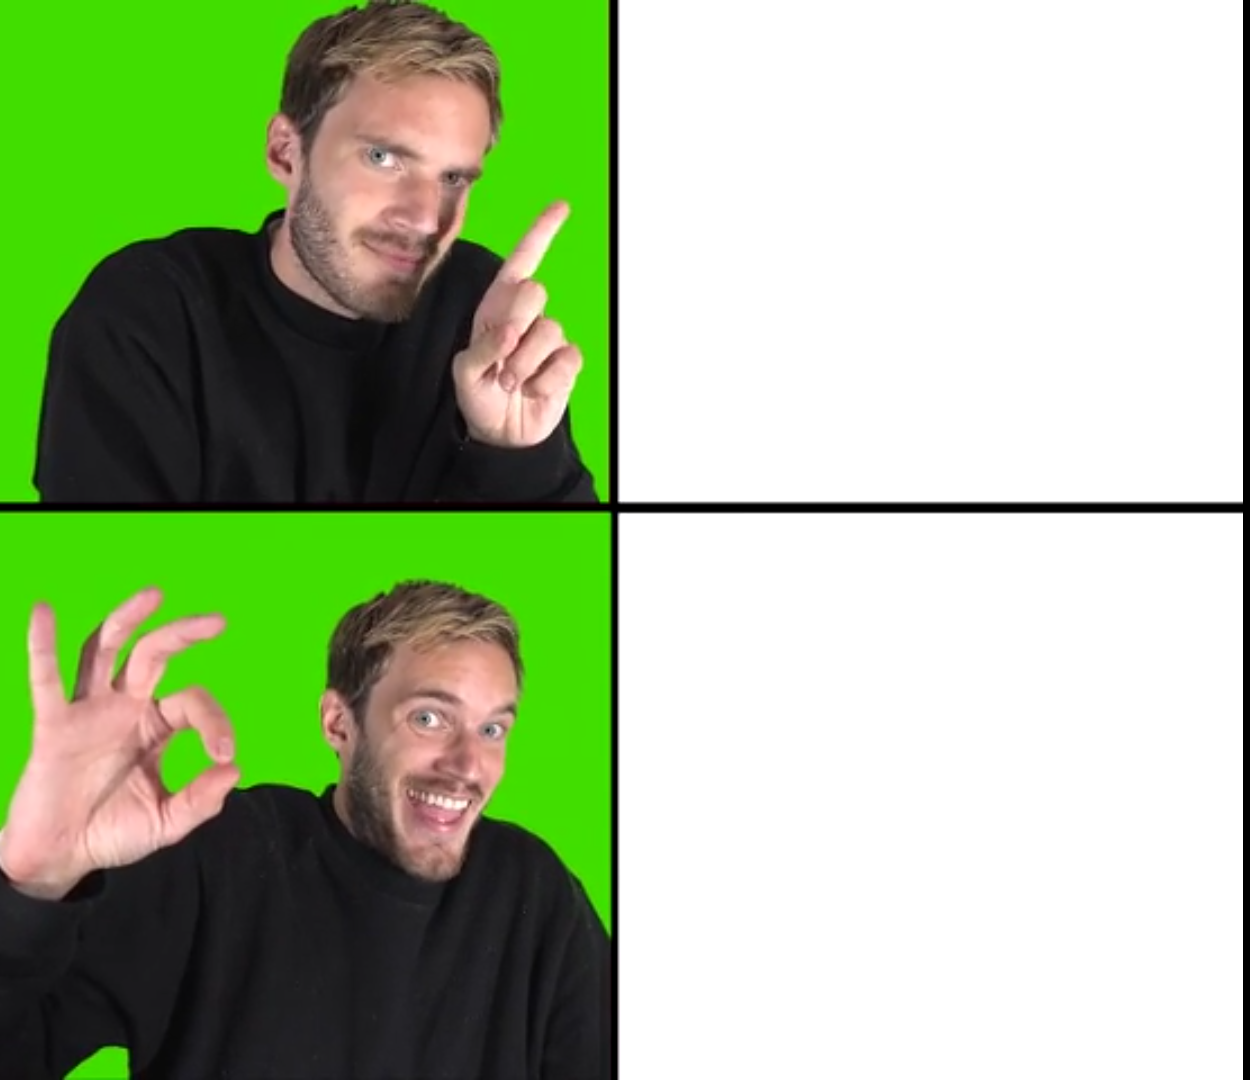 drake meme format empty